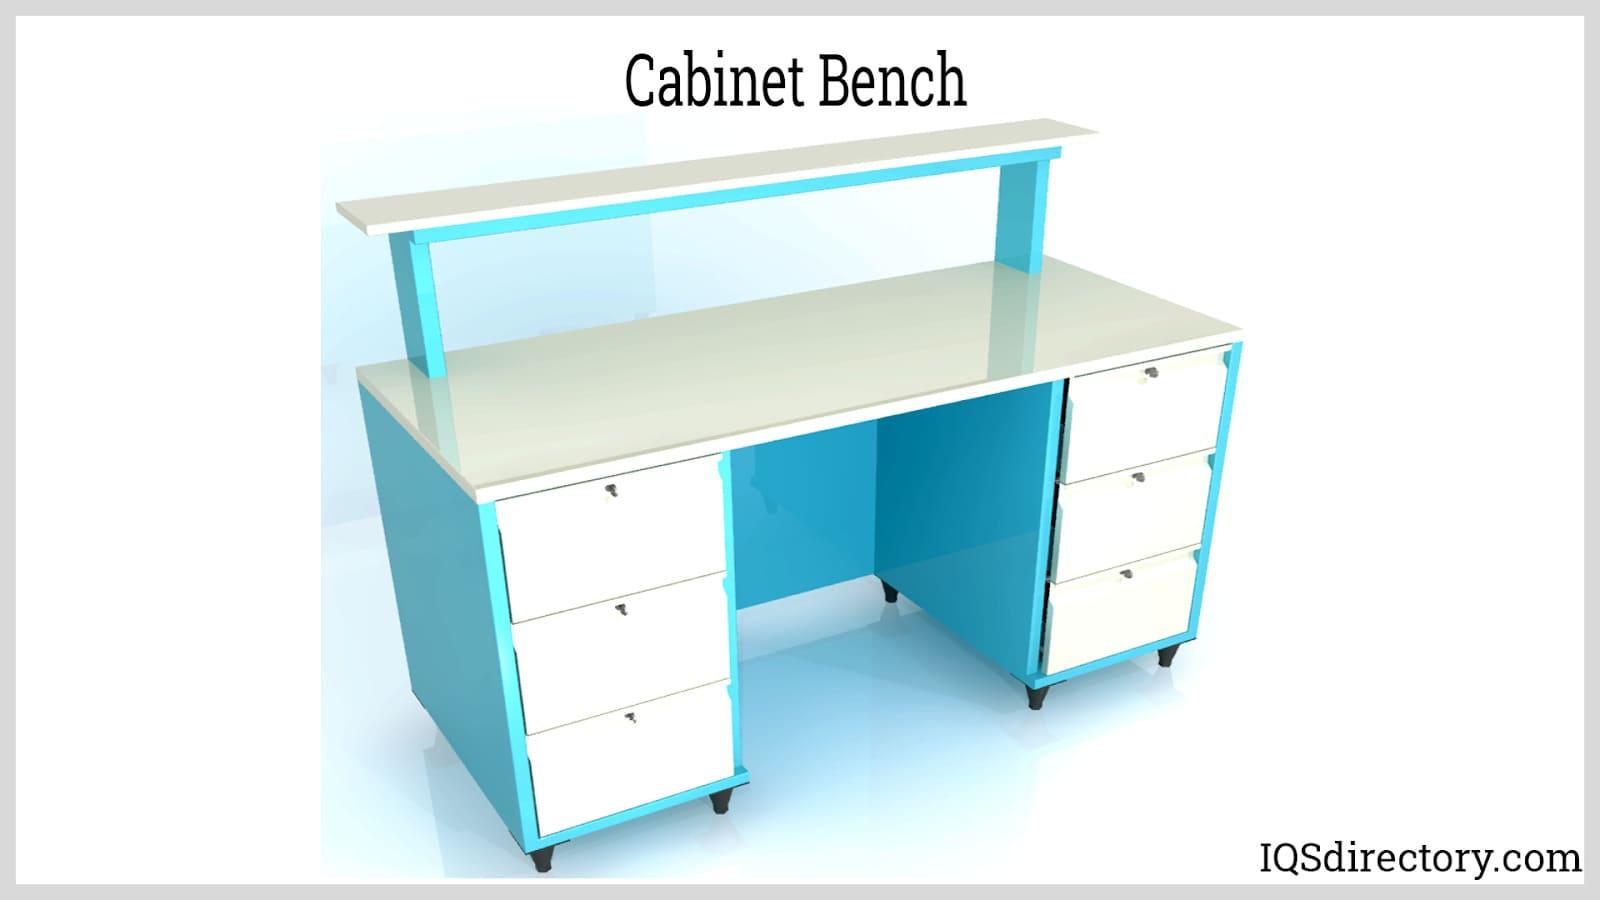 Cabinet Bench